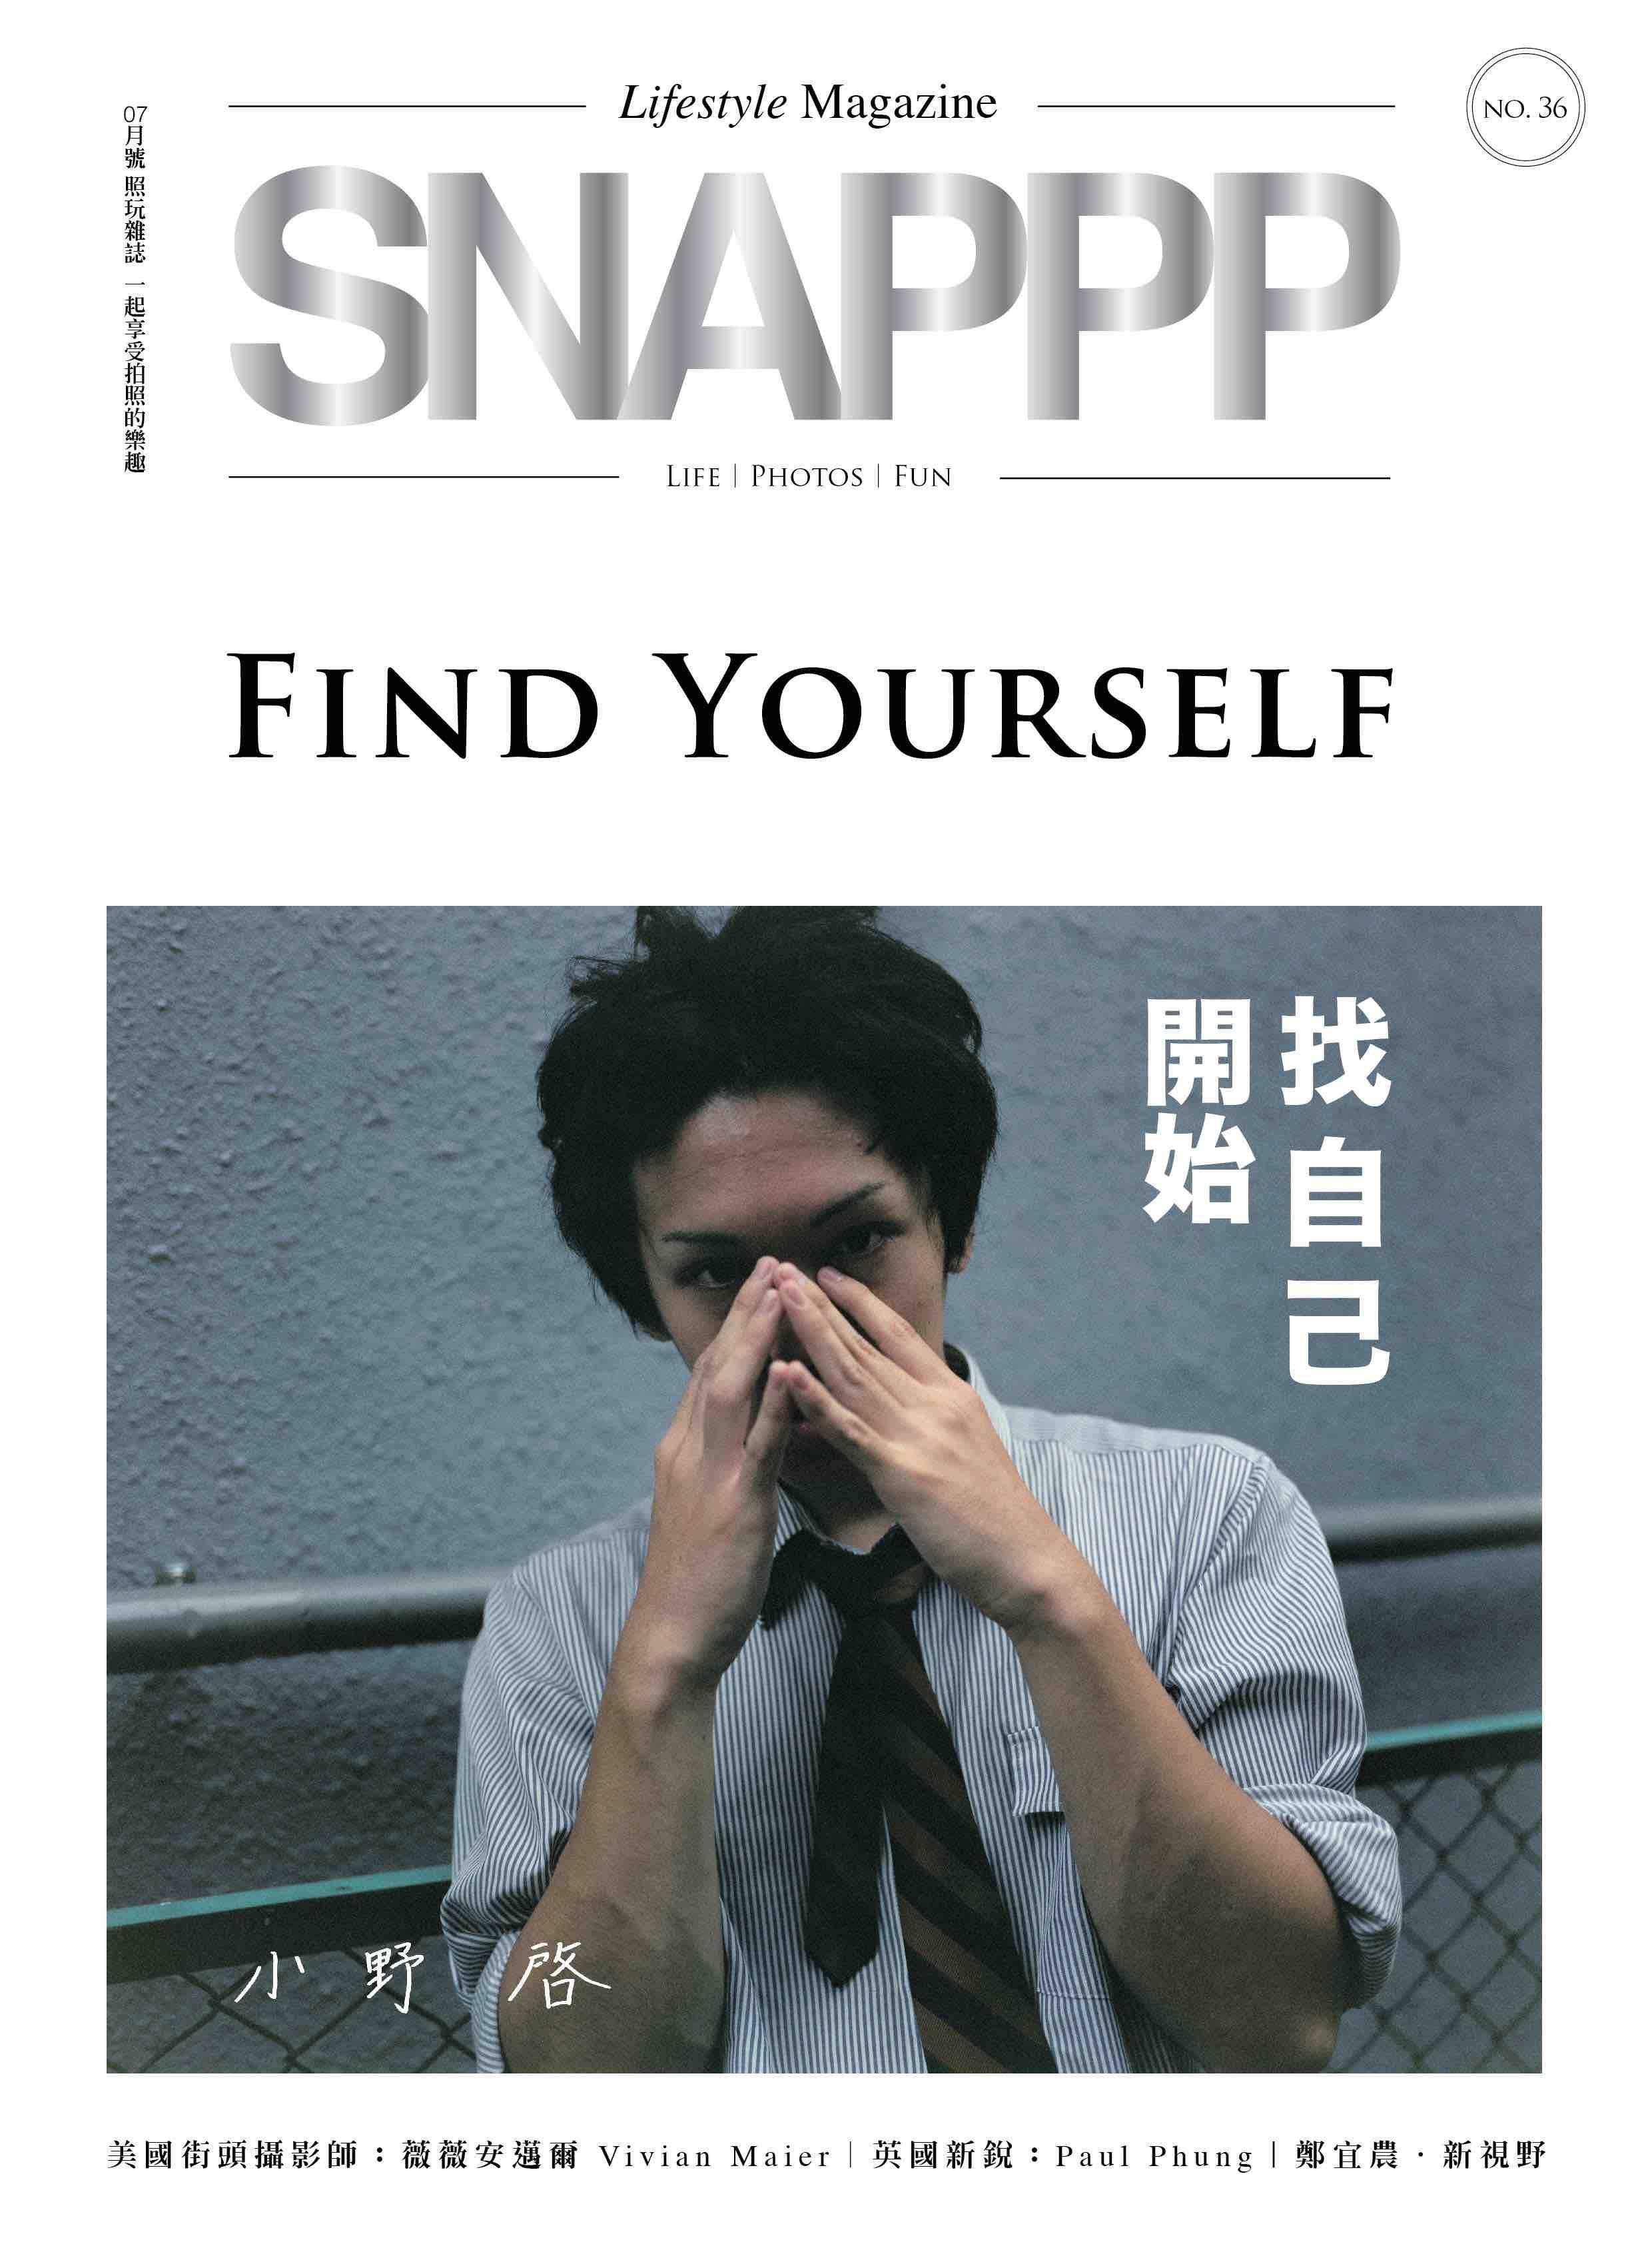 SNAPPP-NO36 COVER-ver1.jpg